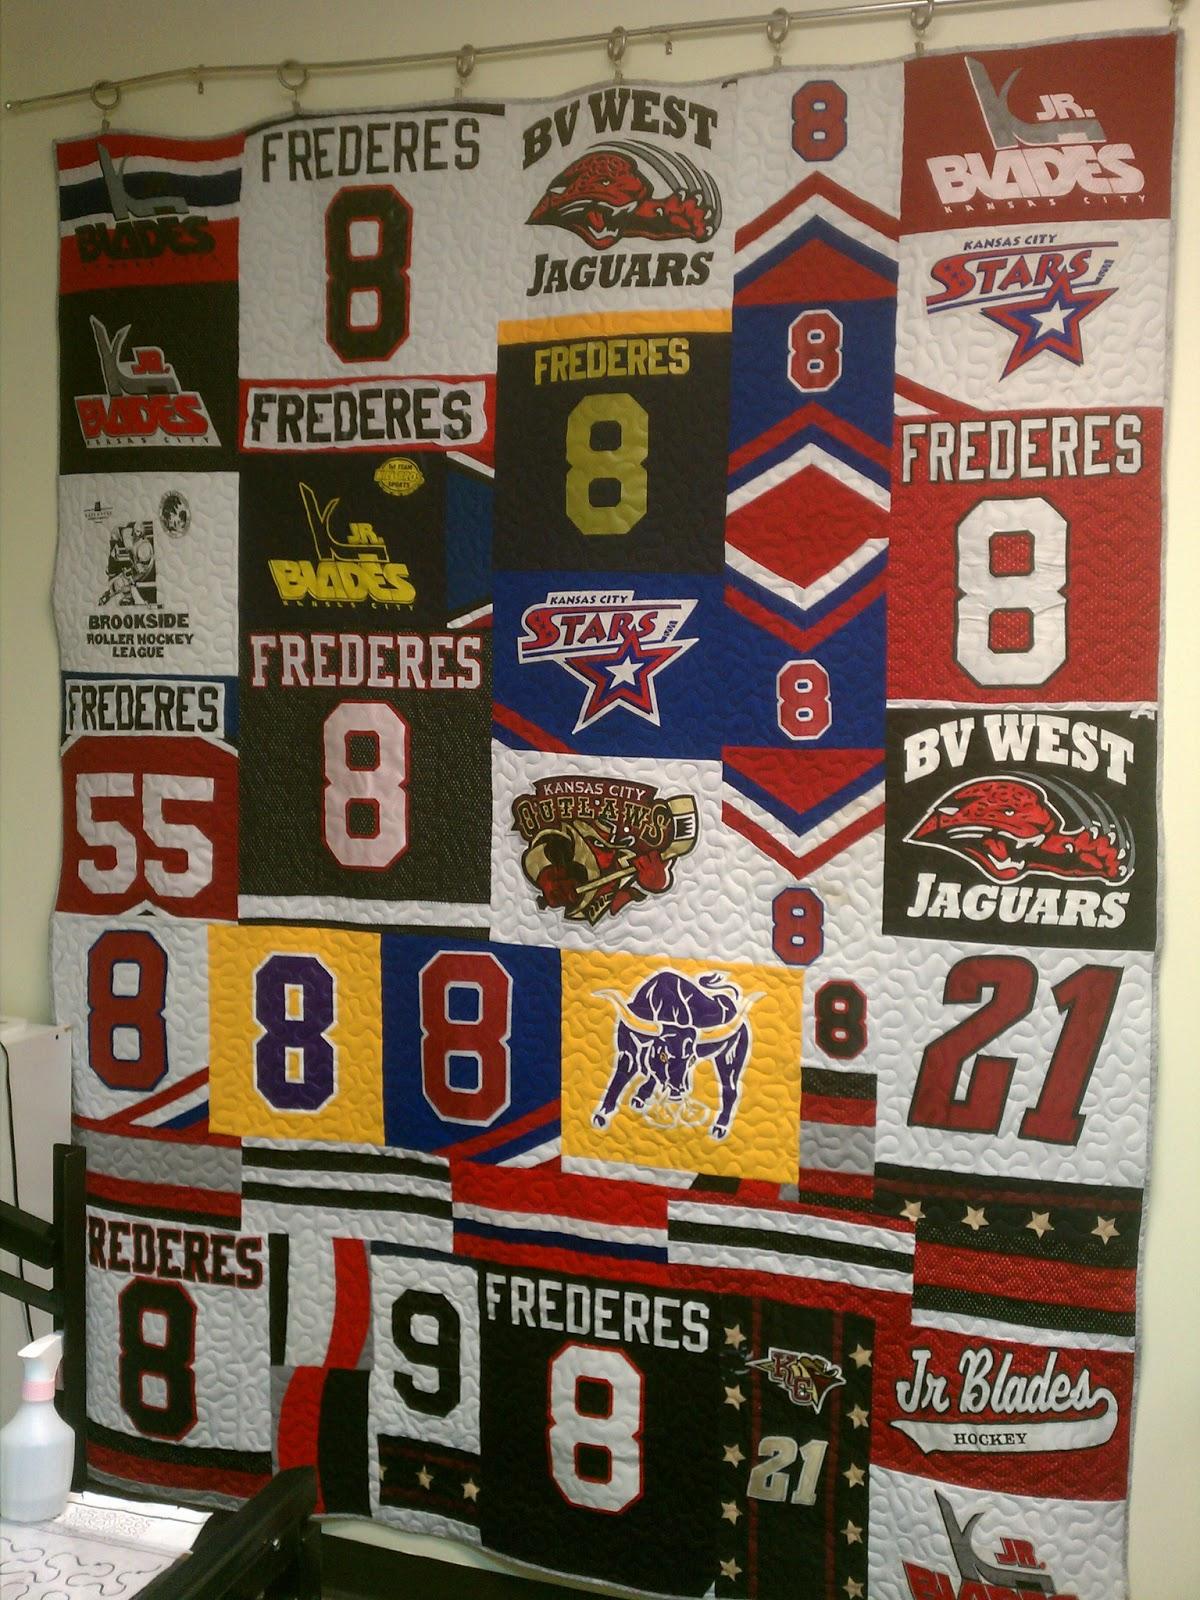 Back Porch Quiltworks: Hockey jersey quilt : jersey quilt - Adamdwight.com